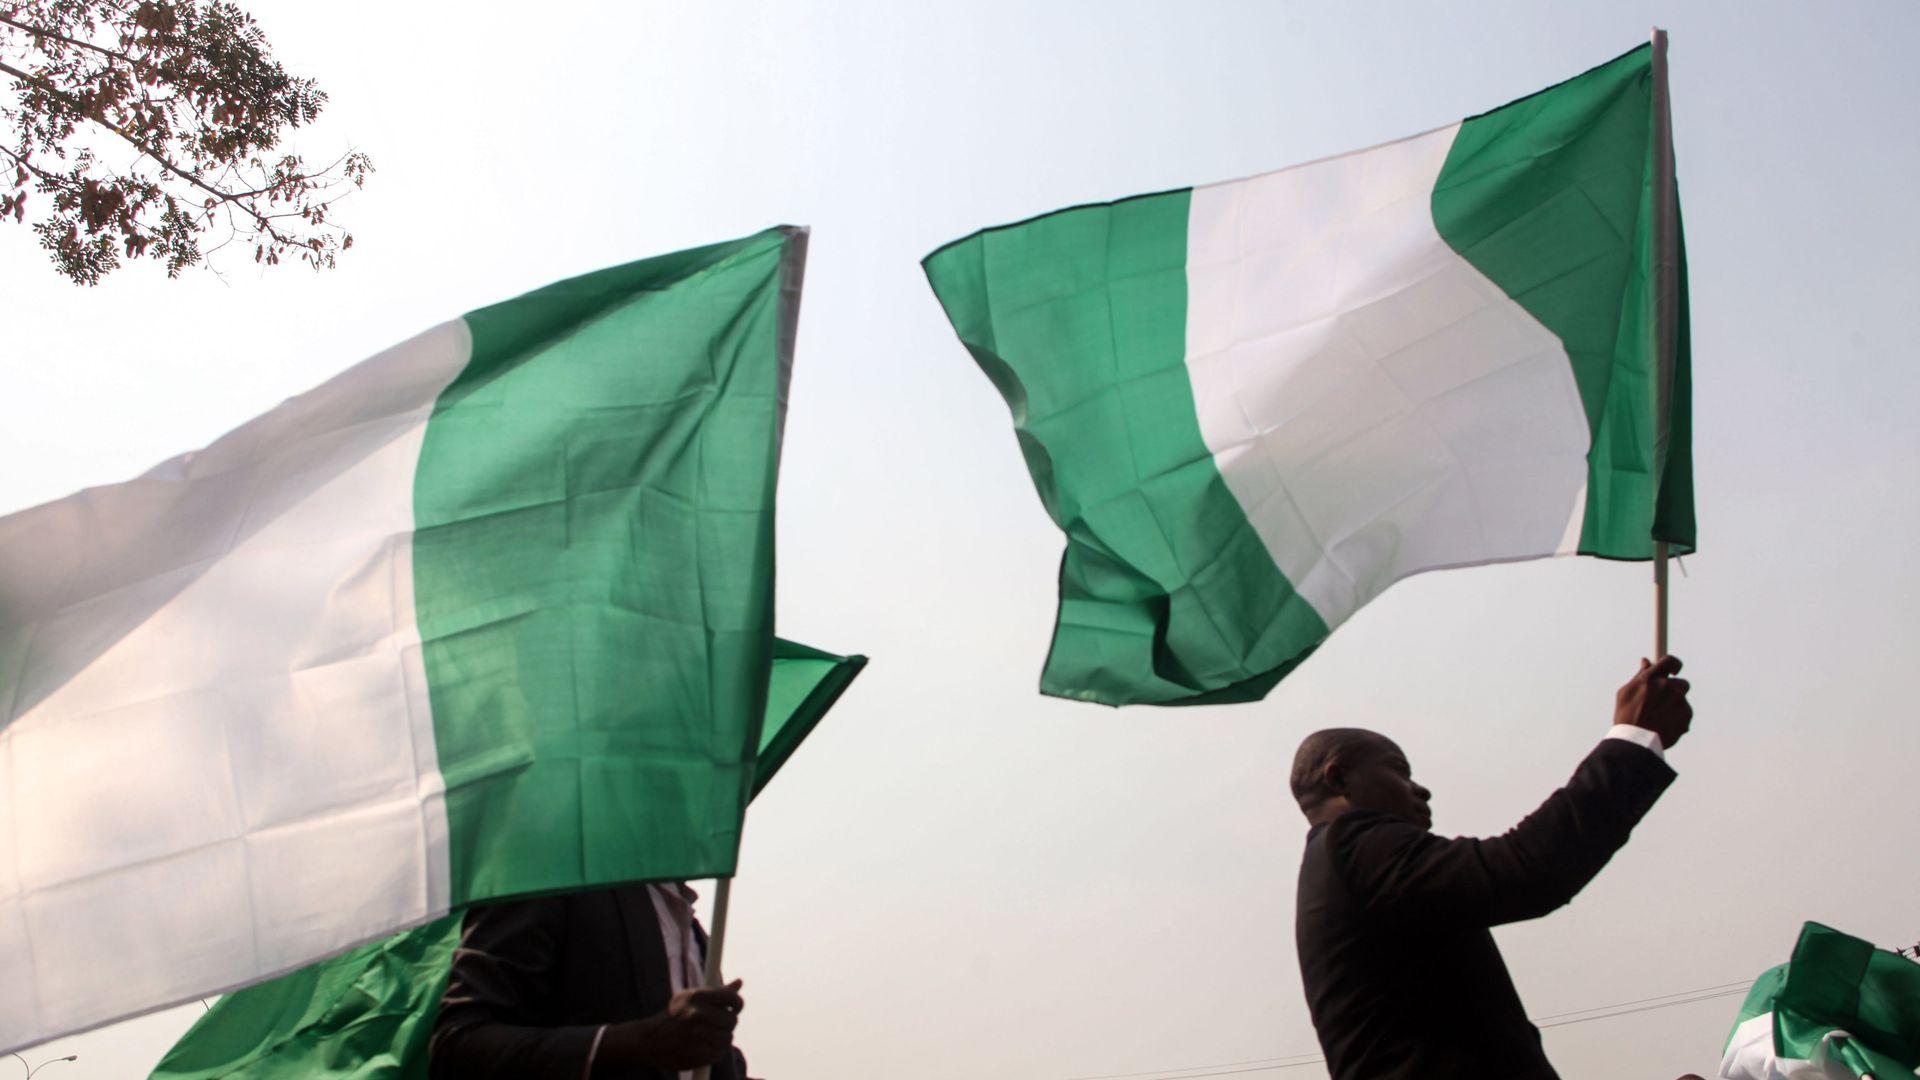 The nigerian flag.